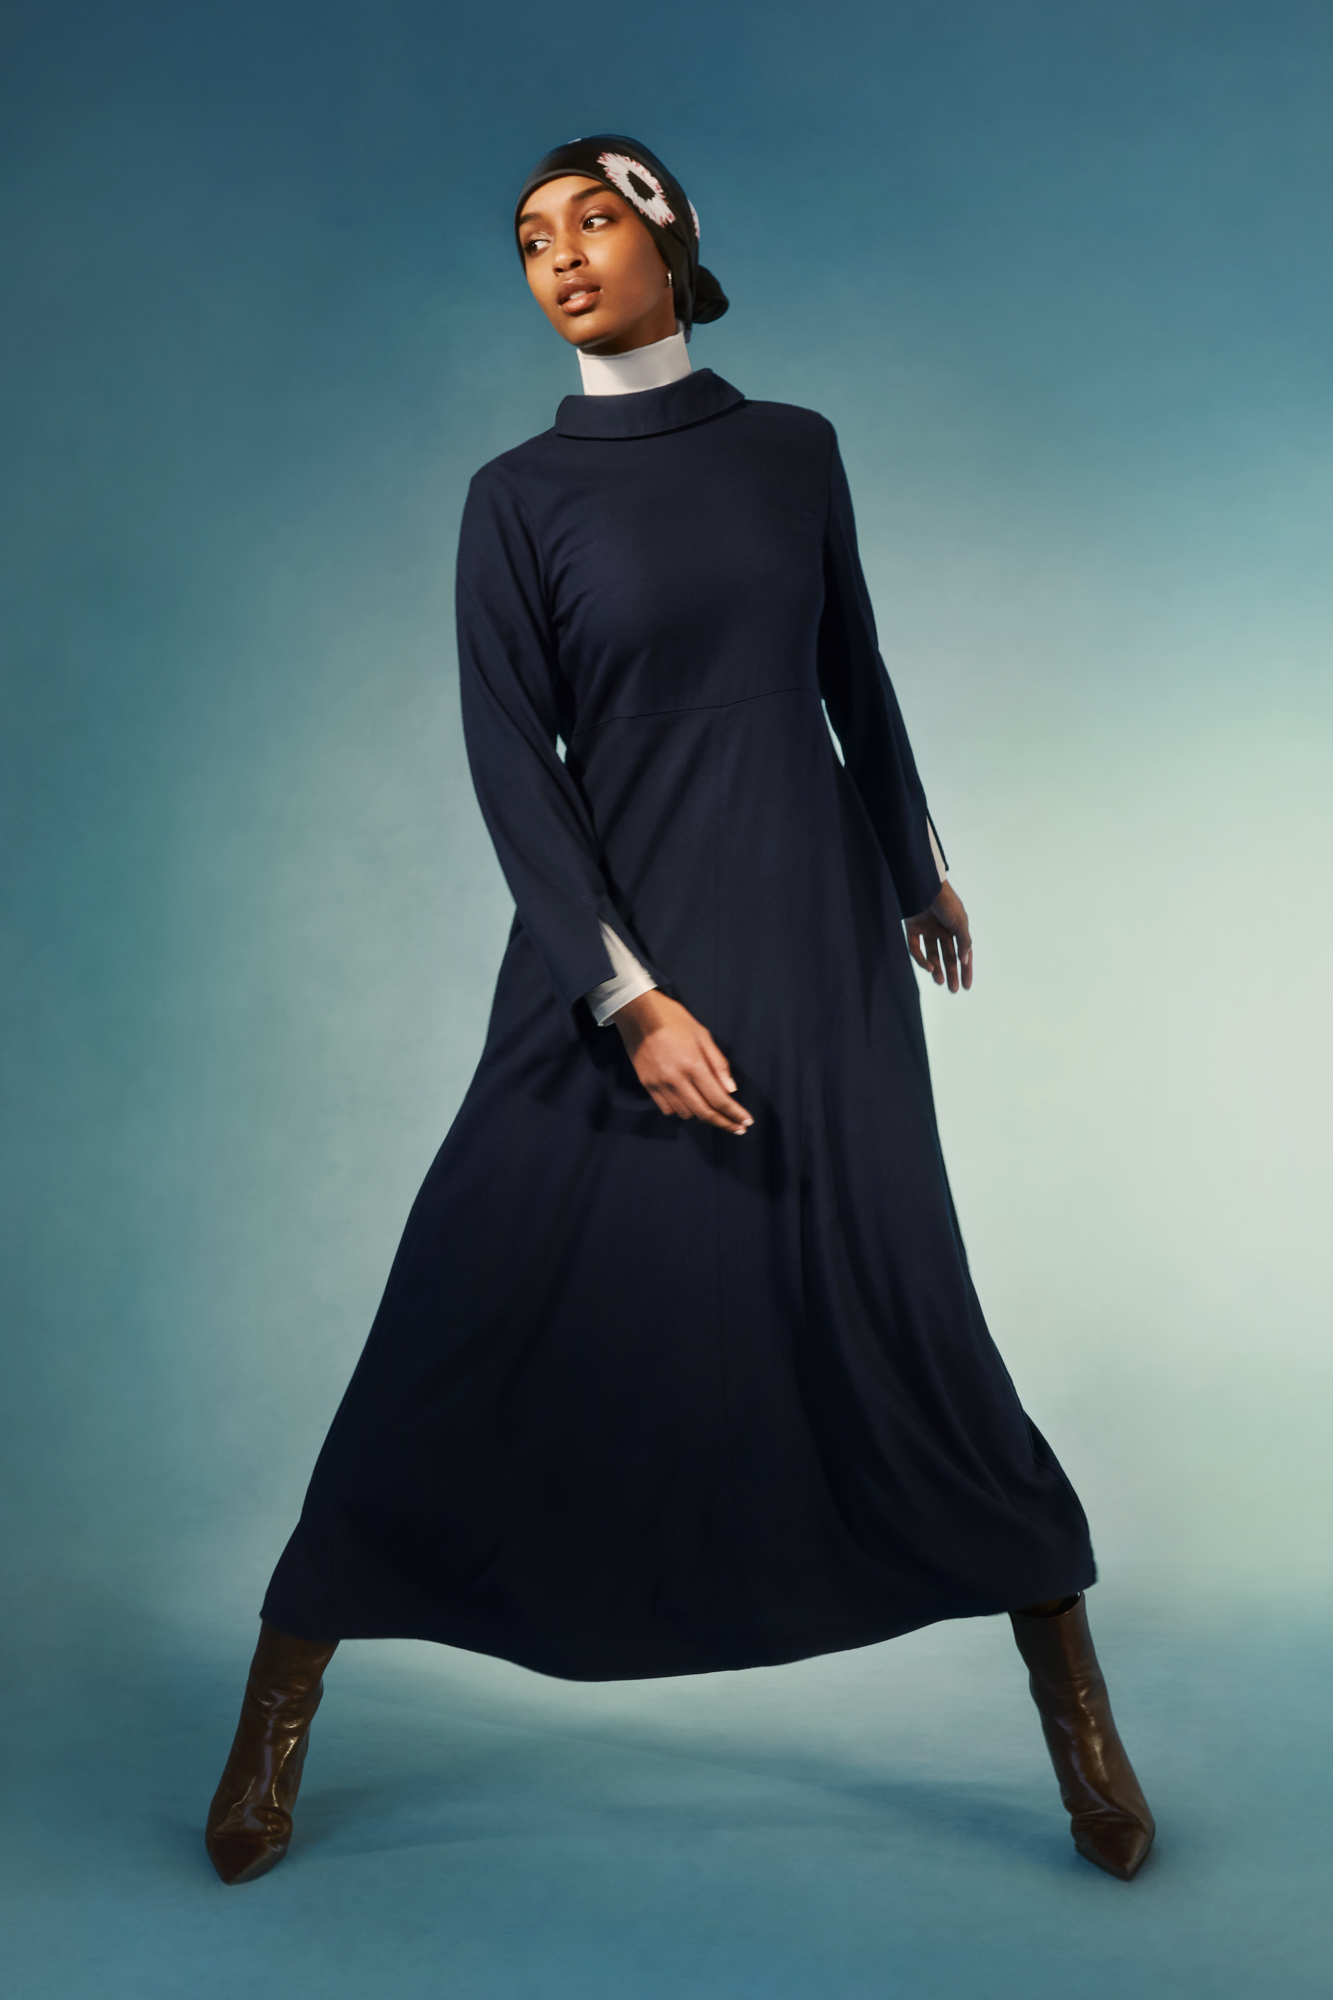 Uniqlo и Хана Таджима представили осенне-зимнюю коллекцию «скромной» одежды (фото 2)